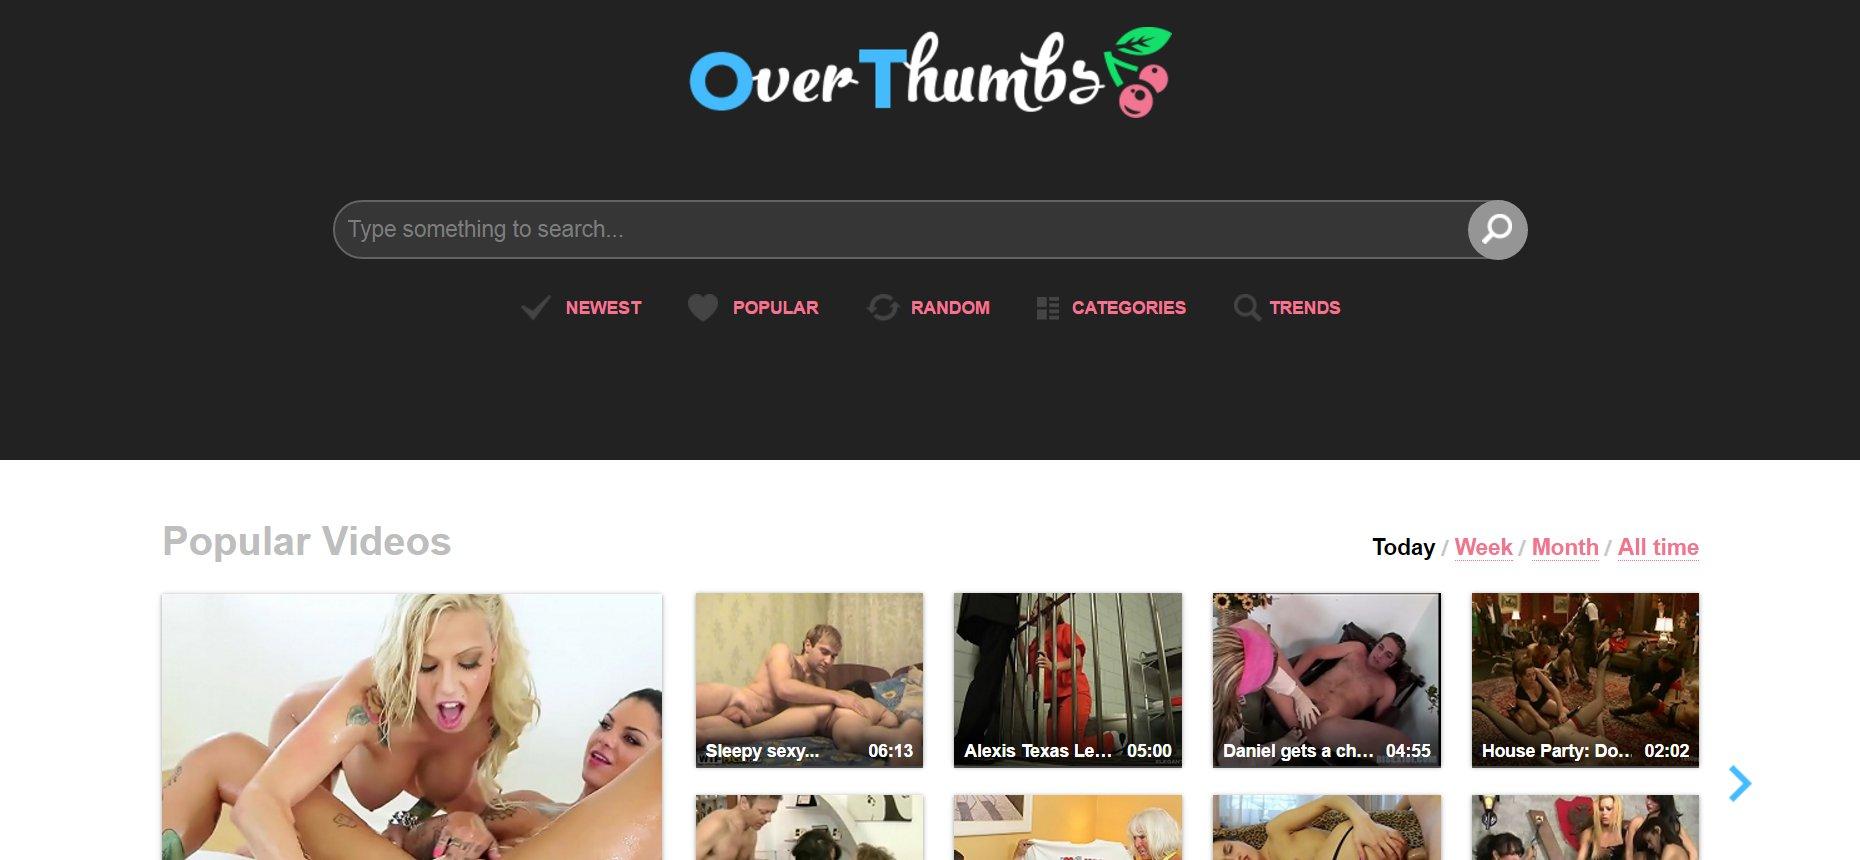 Overthumbs.com